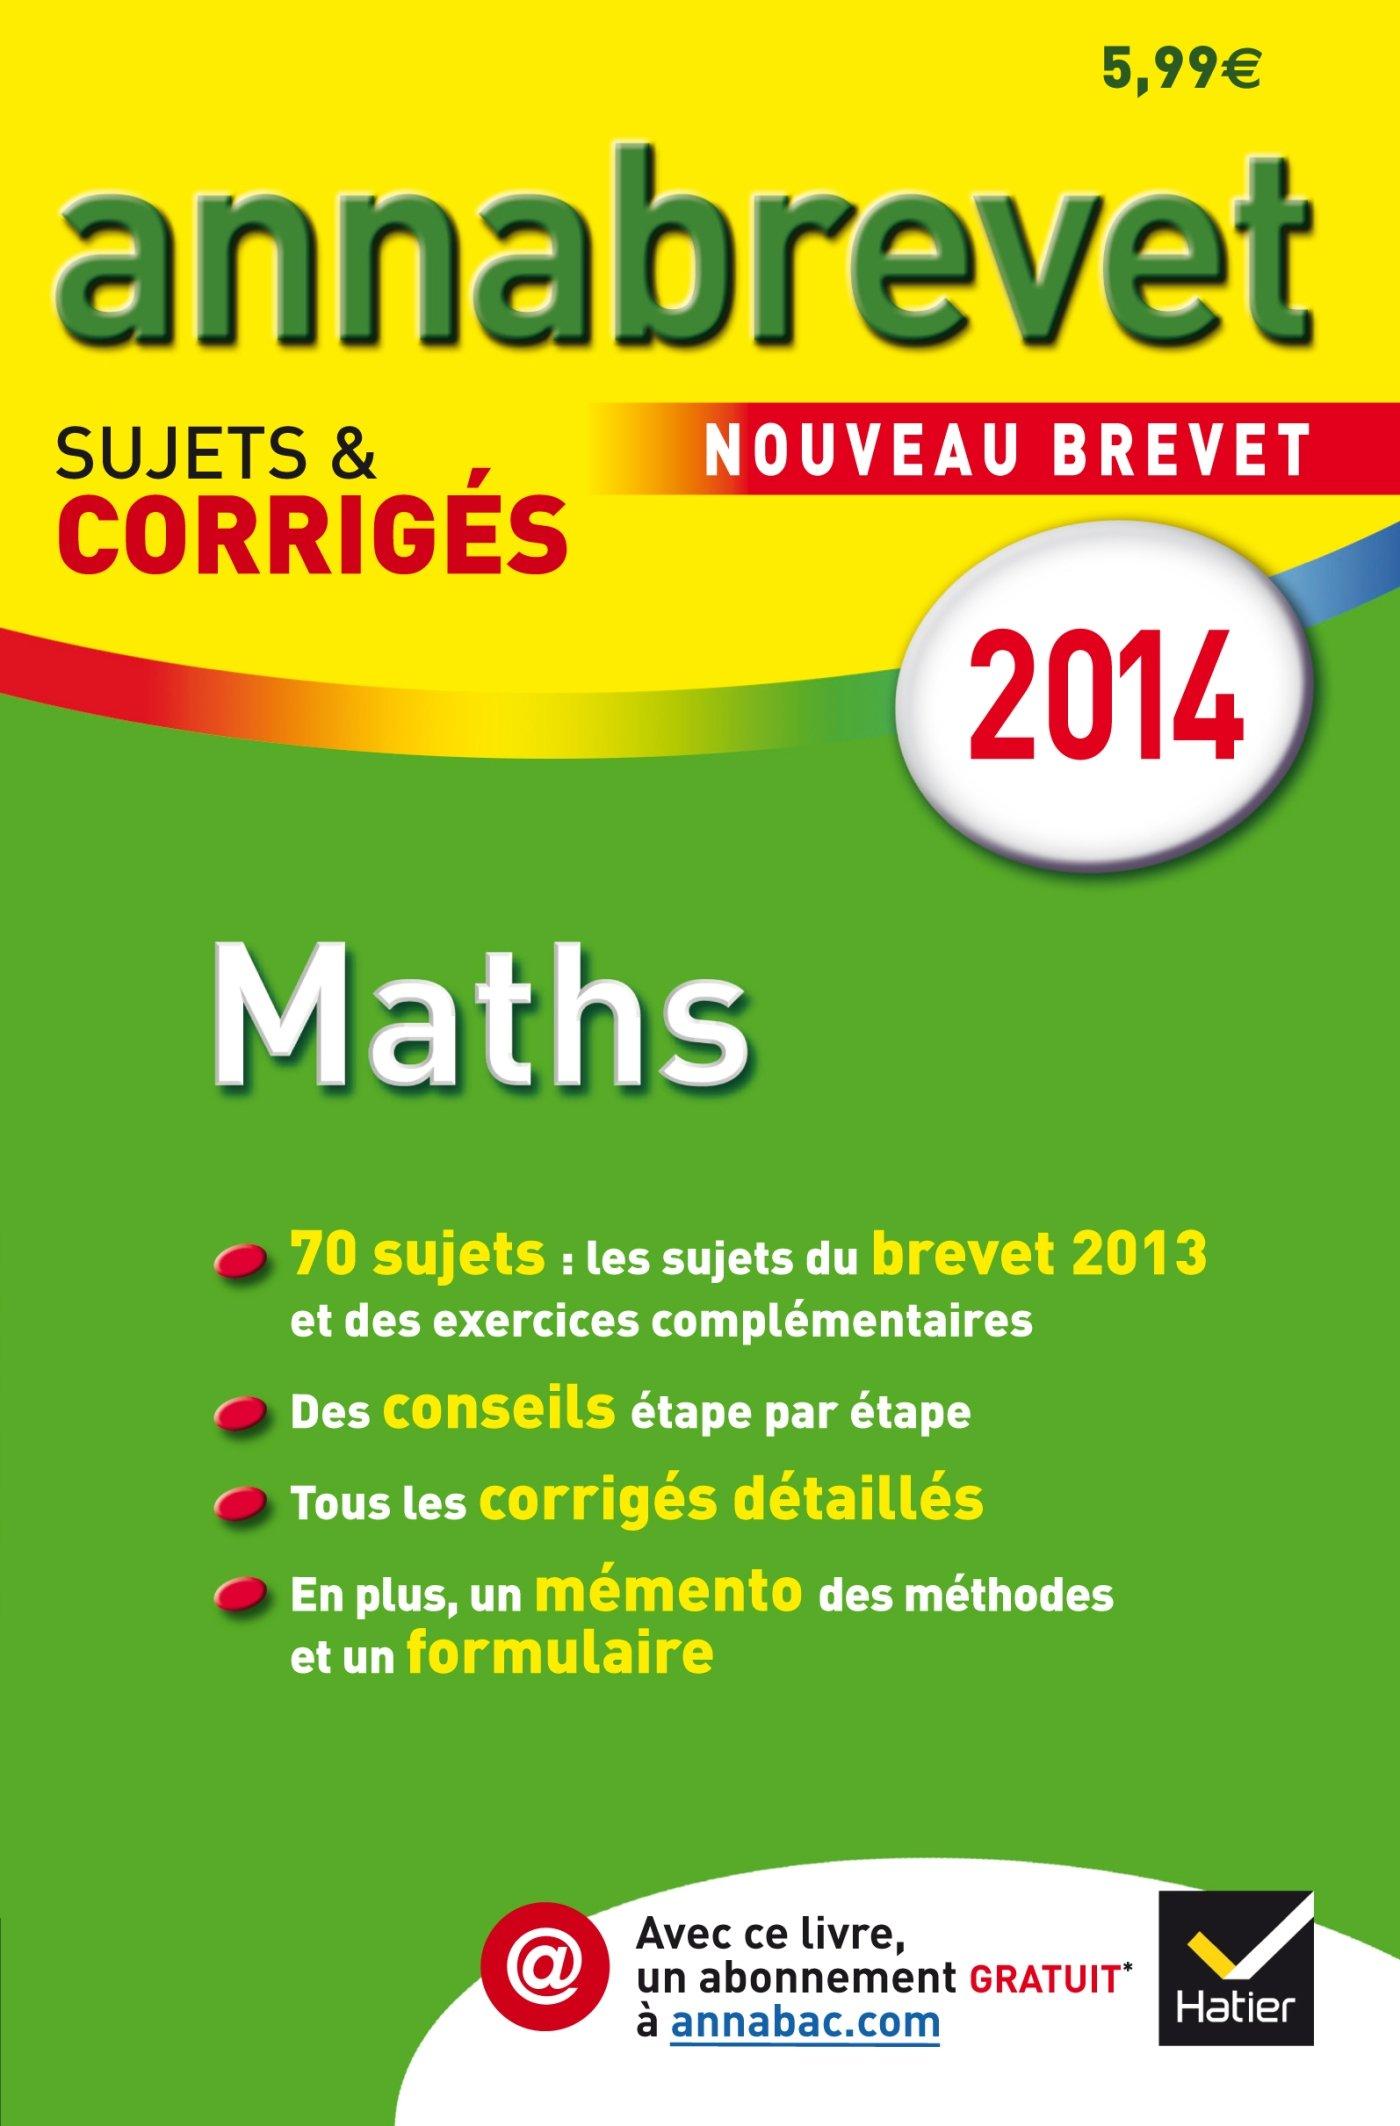 Annales Annabrevet 2014 Maths: sujets et corrigés du brevet - 3e: Amazon.es: Bernard Demeillers: Libros en idiomas extranjeros